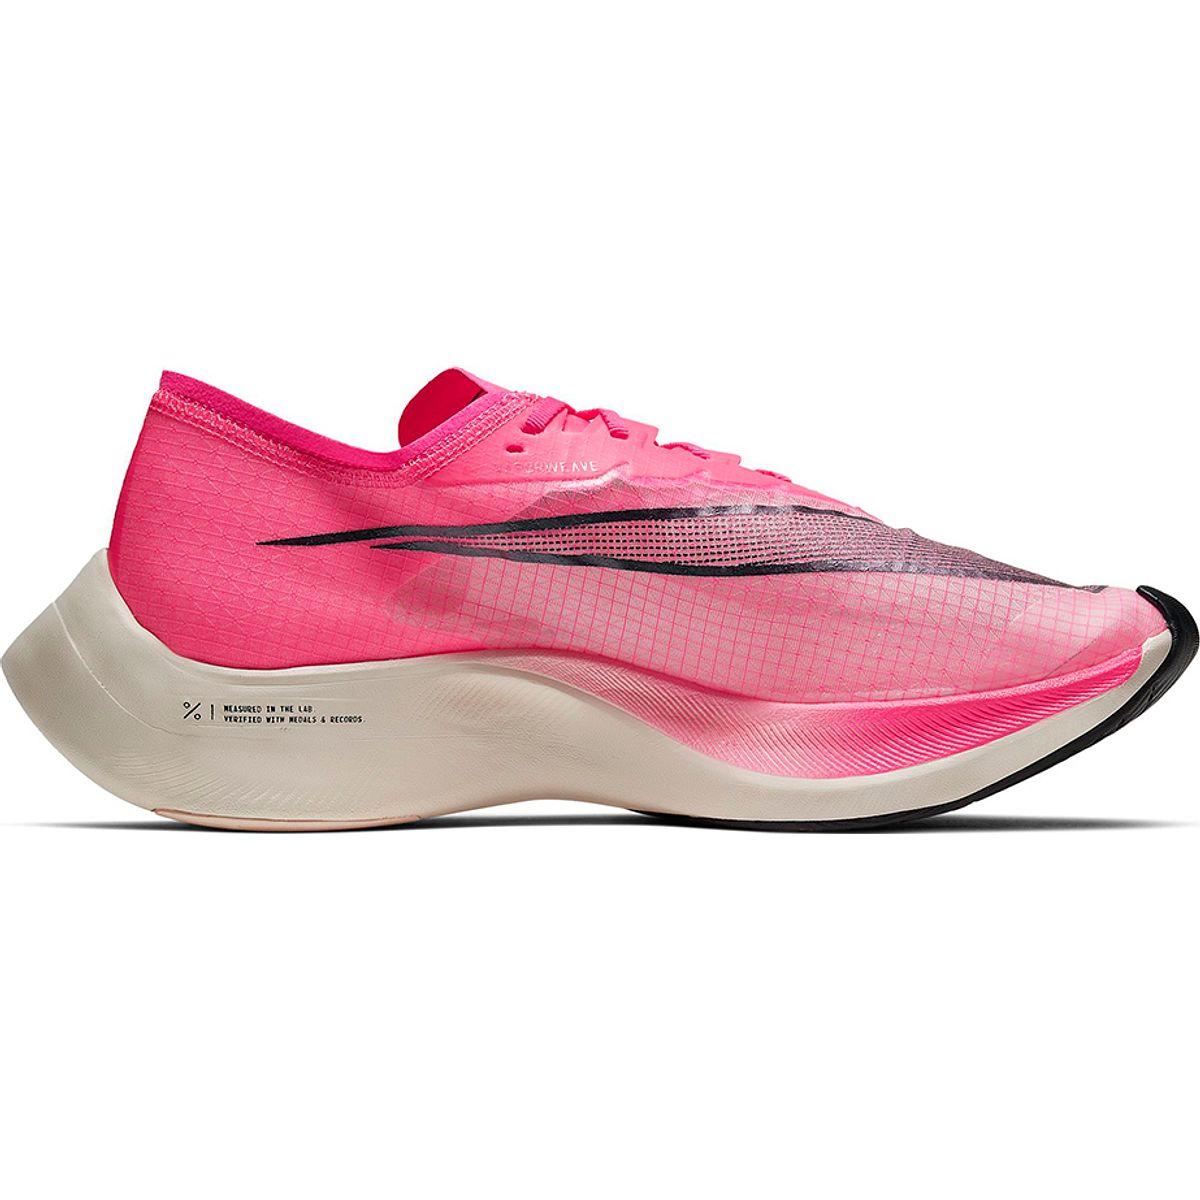 Nike Zoom Vaporfly Next Fleet Feet